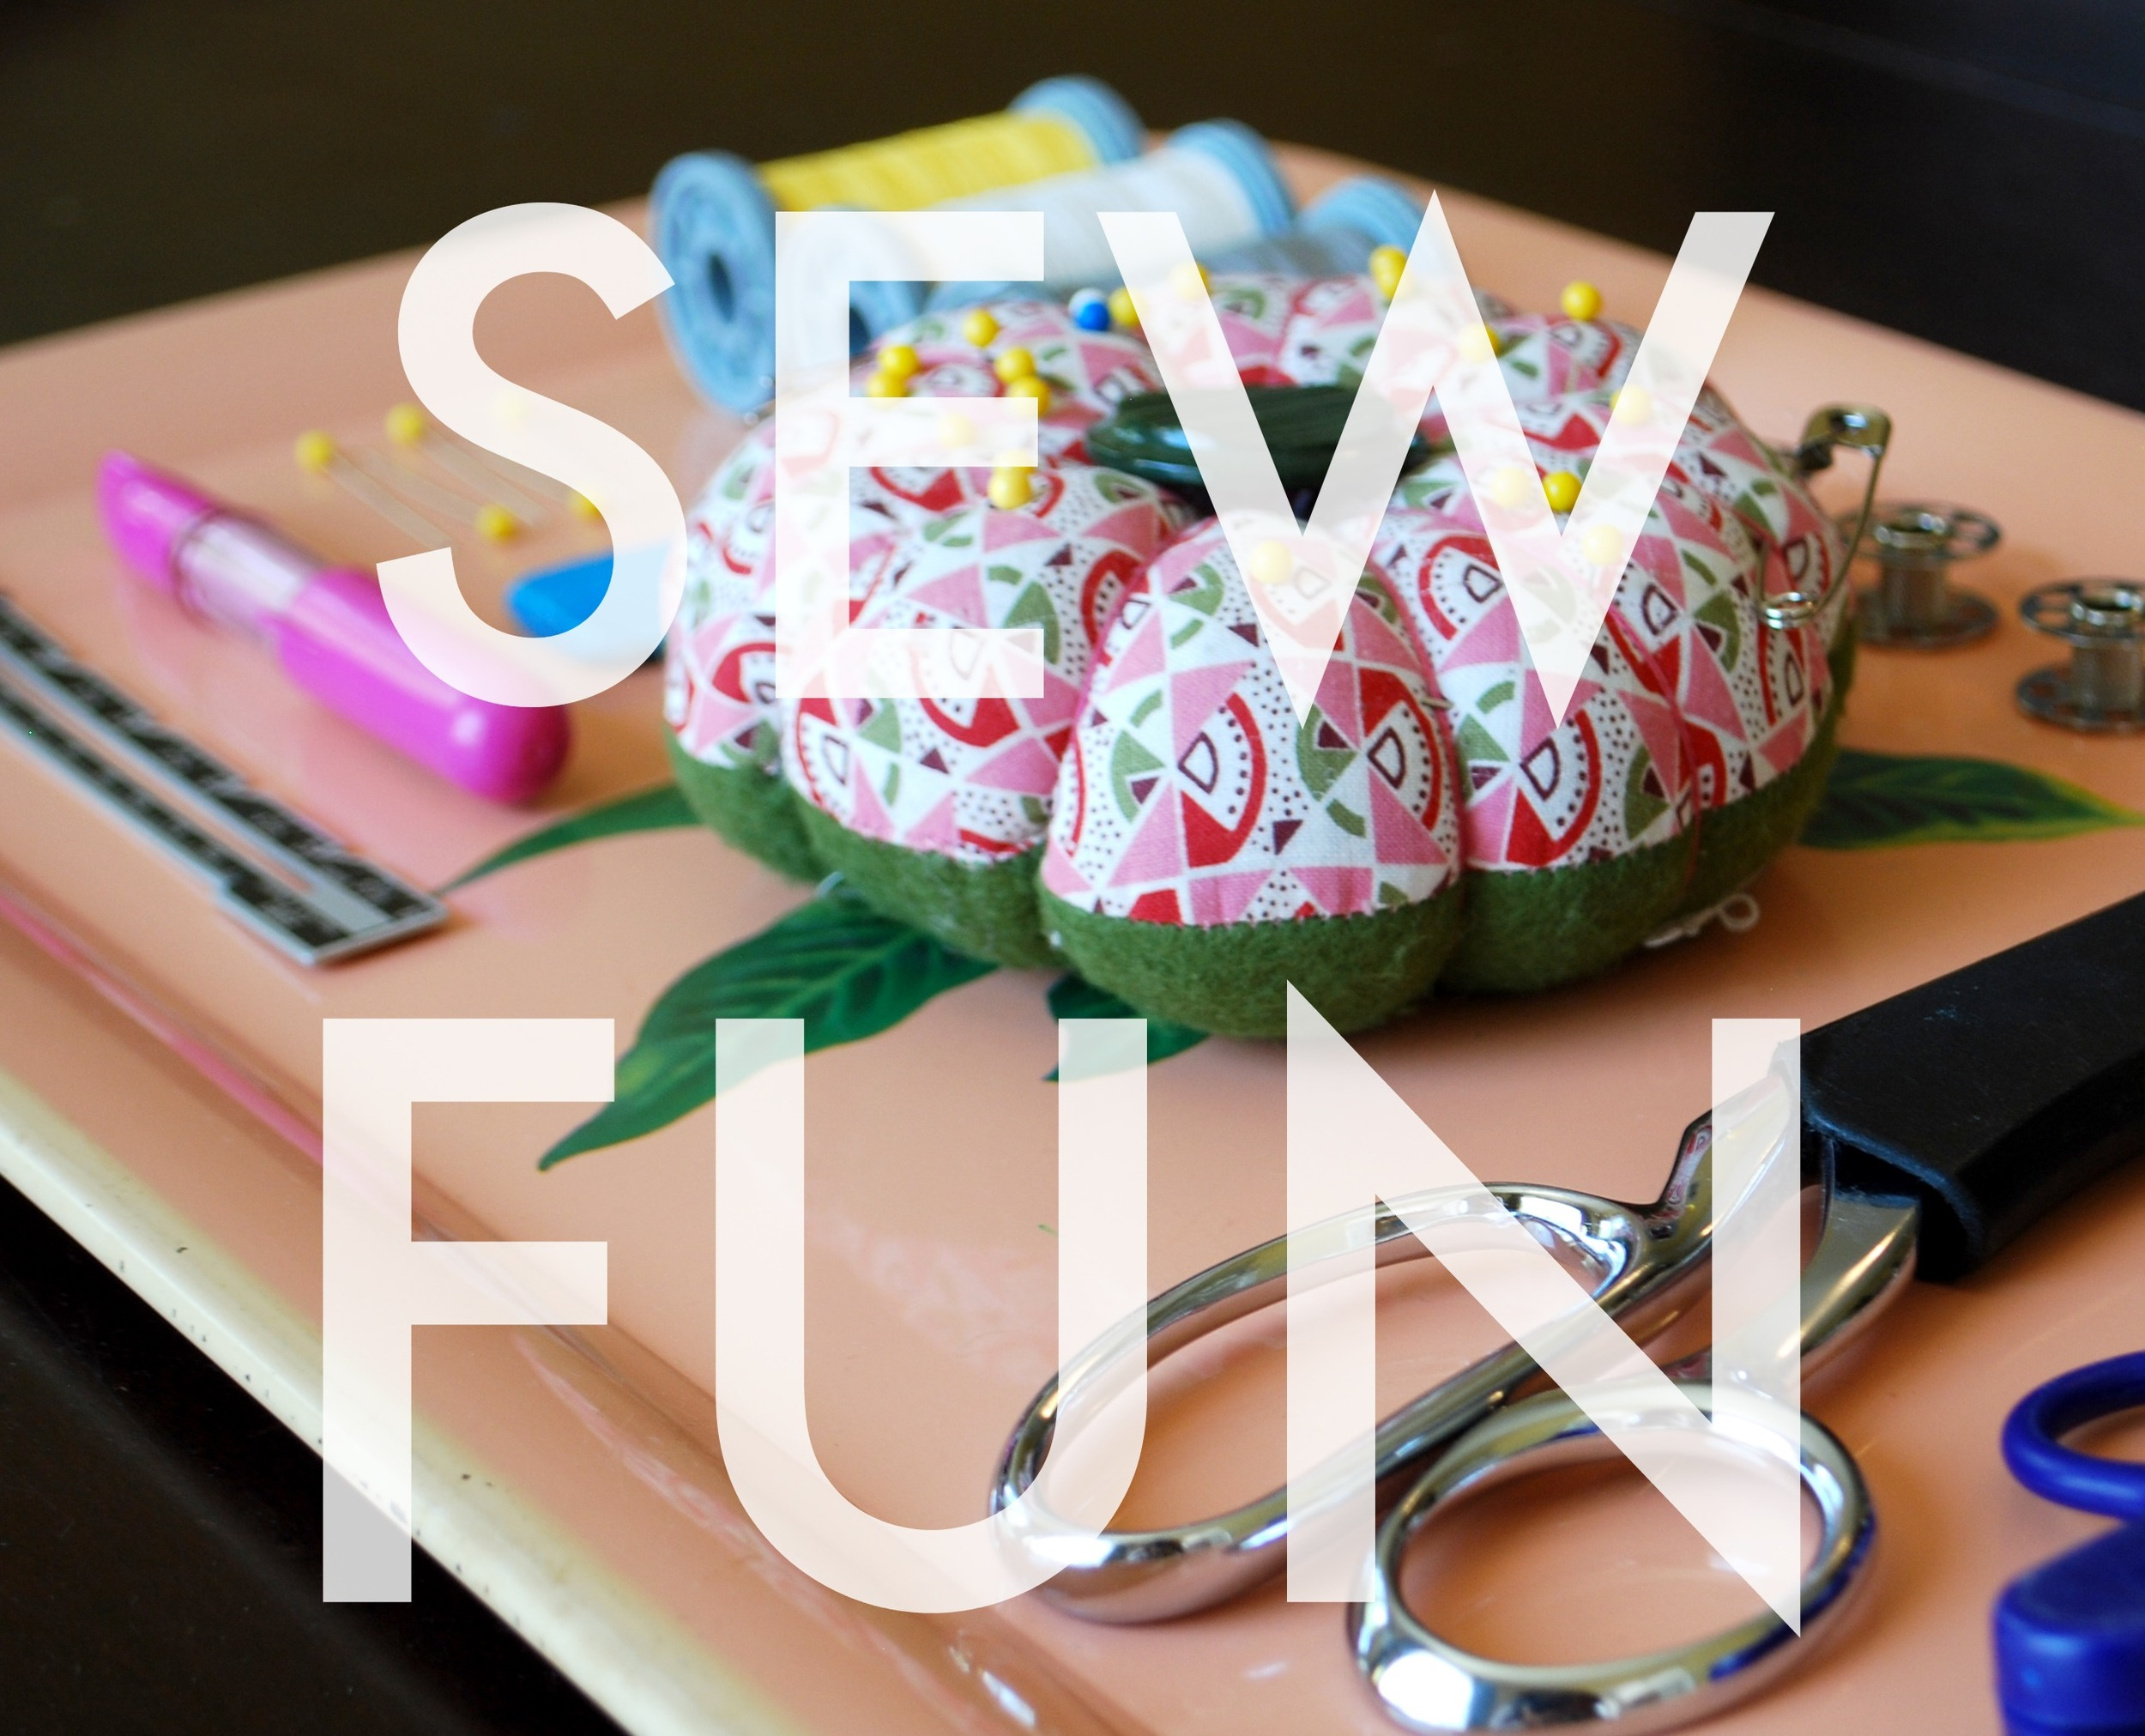 Sew Fun Workshop   Sew You Studio.com